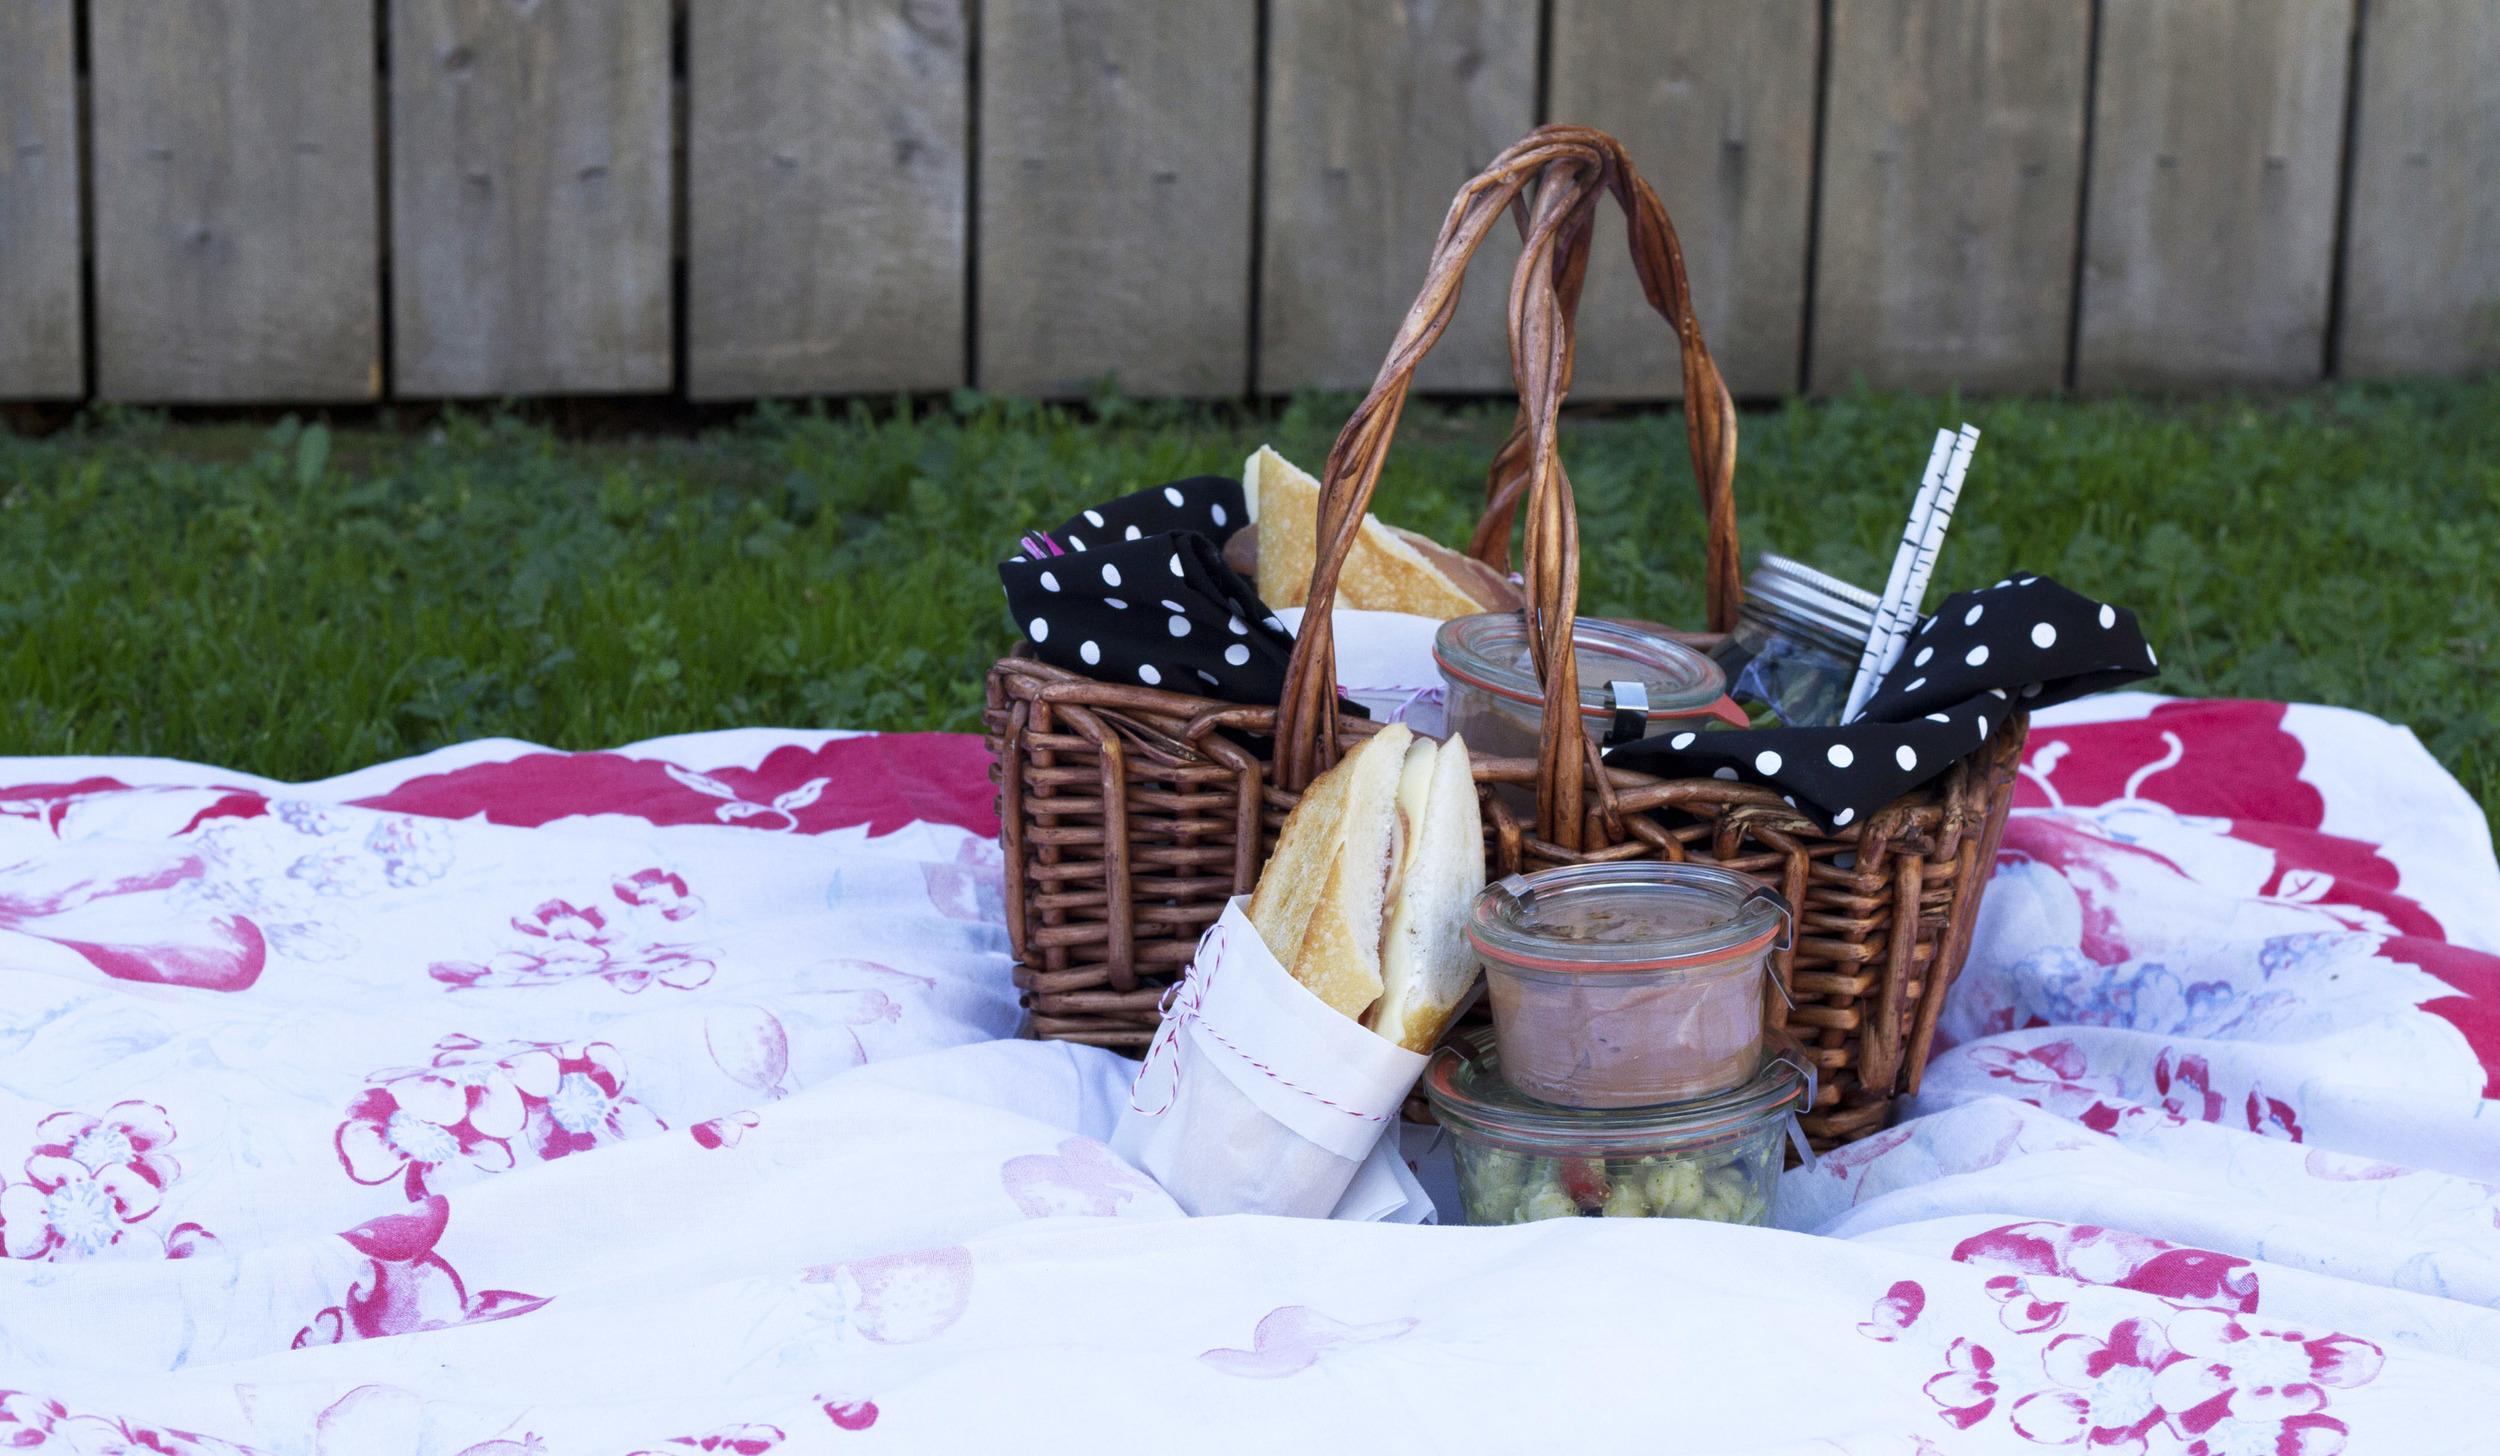 picnic on grass long.jpg